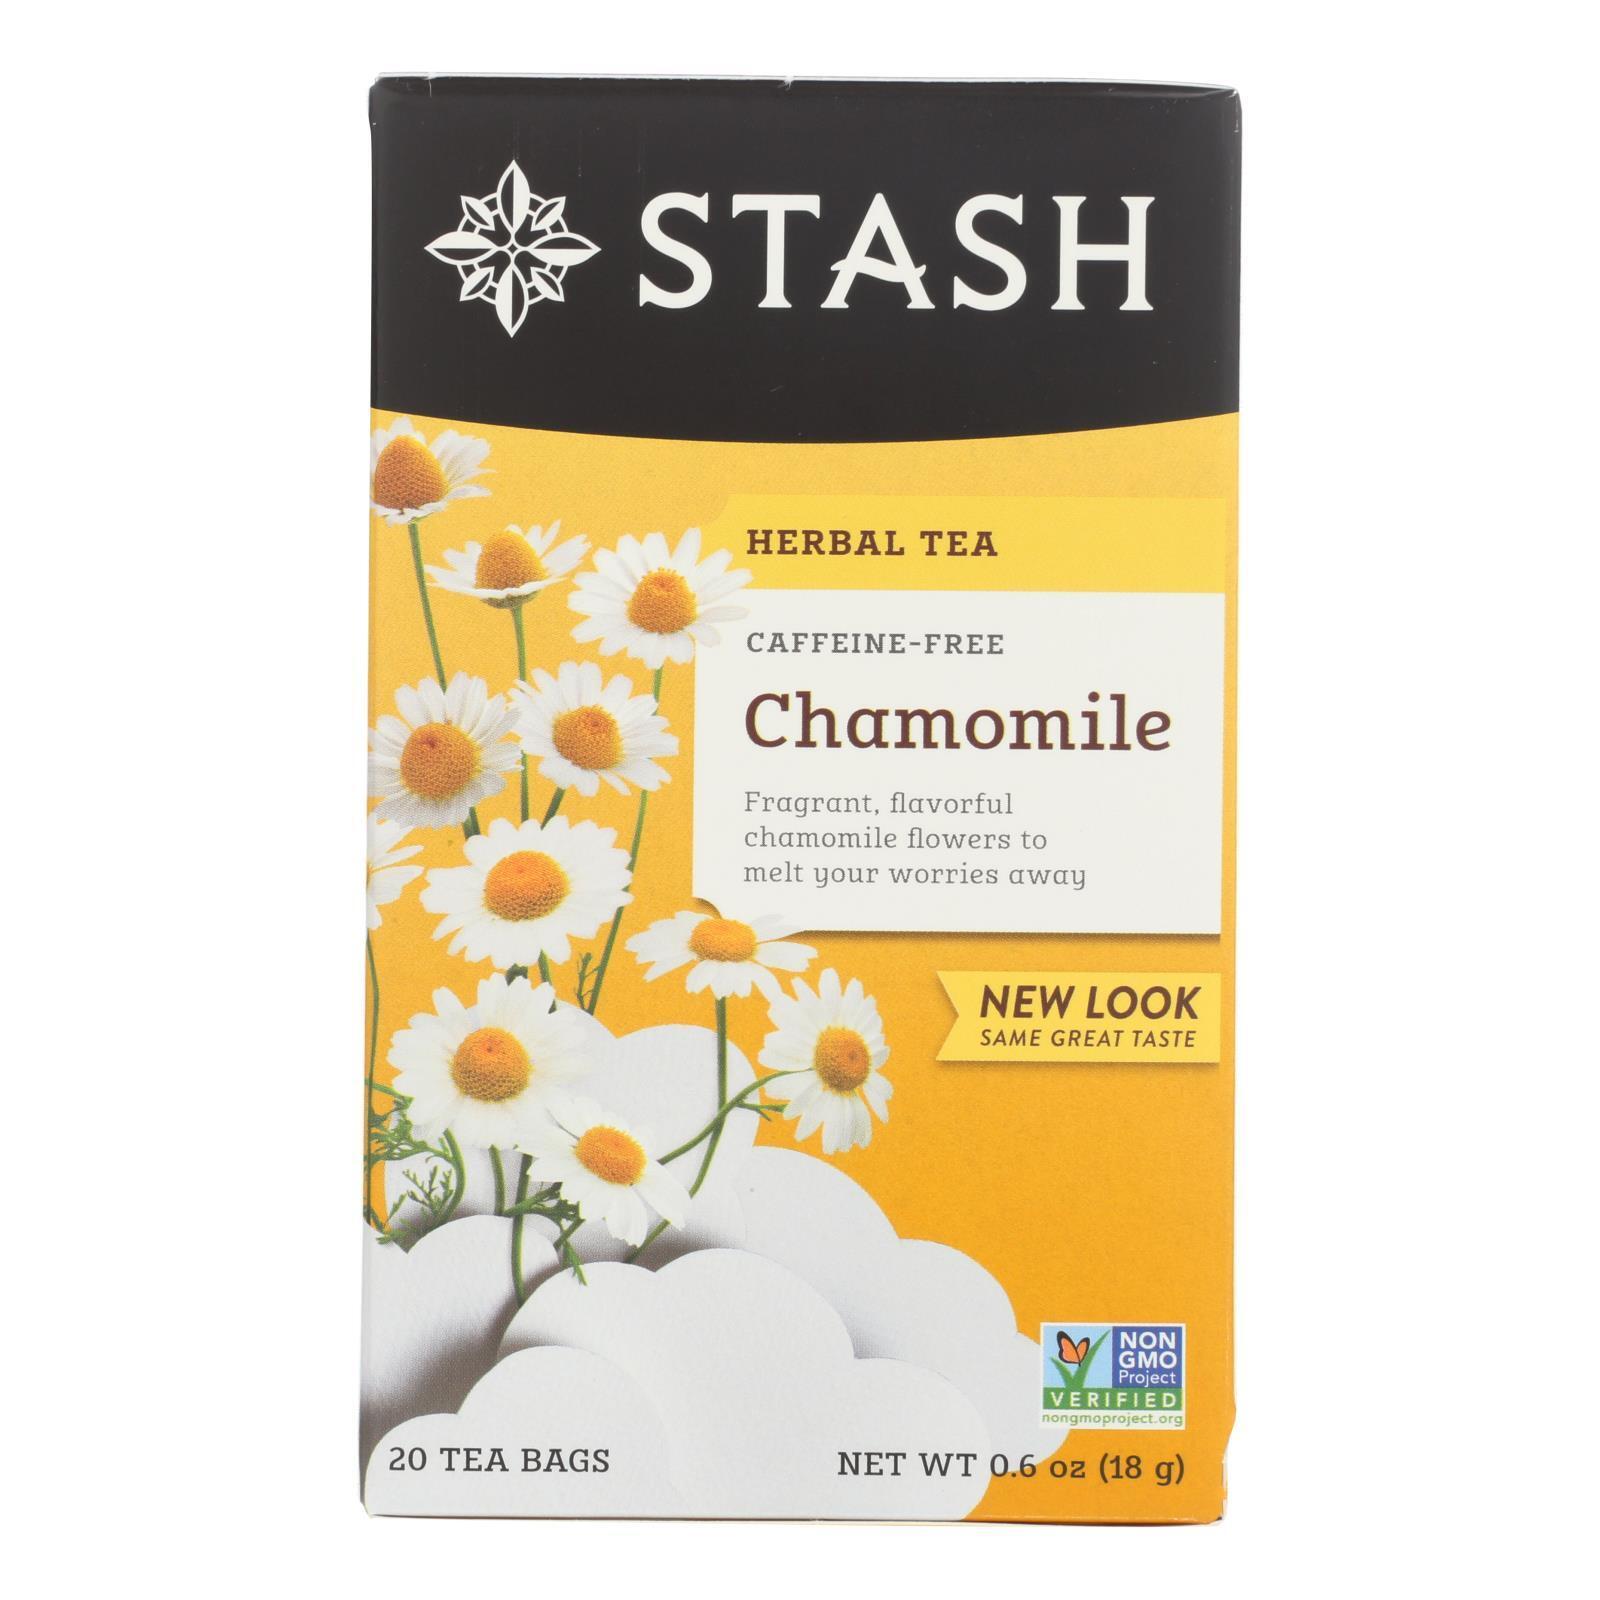 Stash Tea - Herbal - Chamomile - 20 Bags - Case of 6